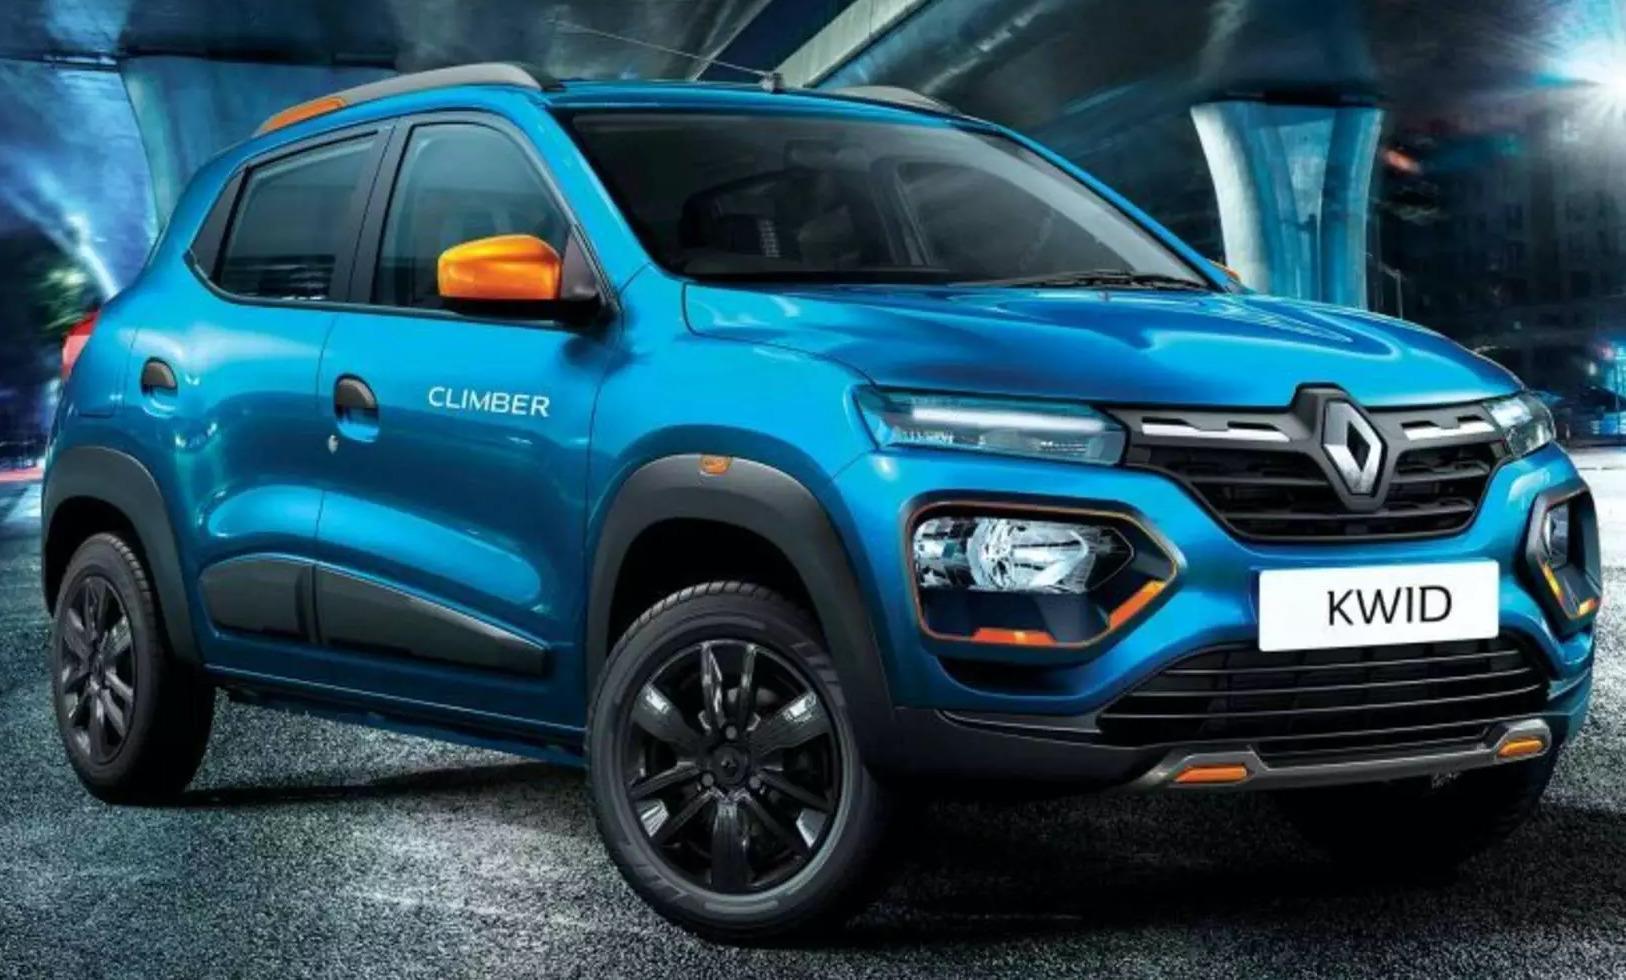 mobil-baru-murah-rnault-kwid-climber-2021